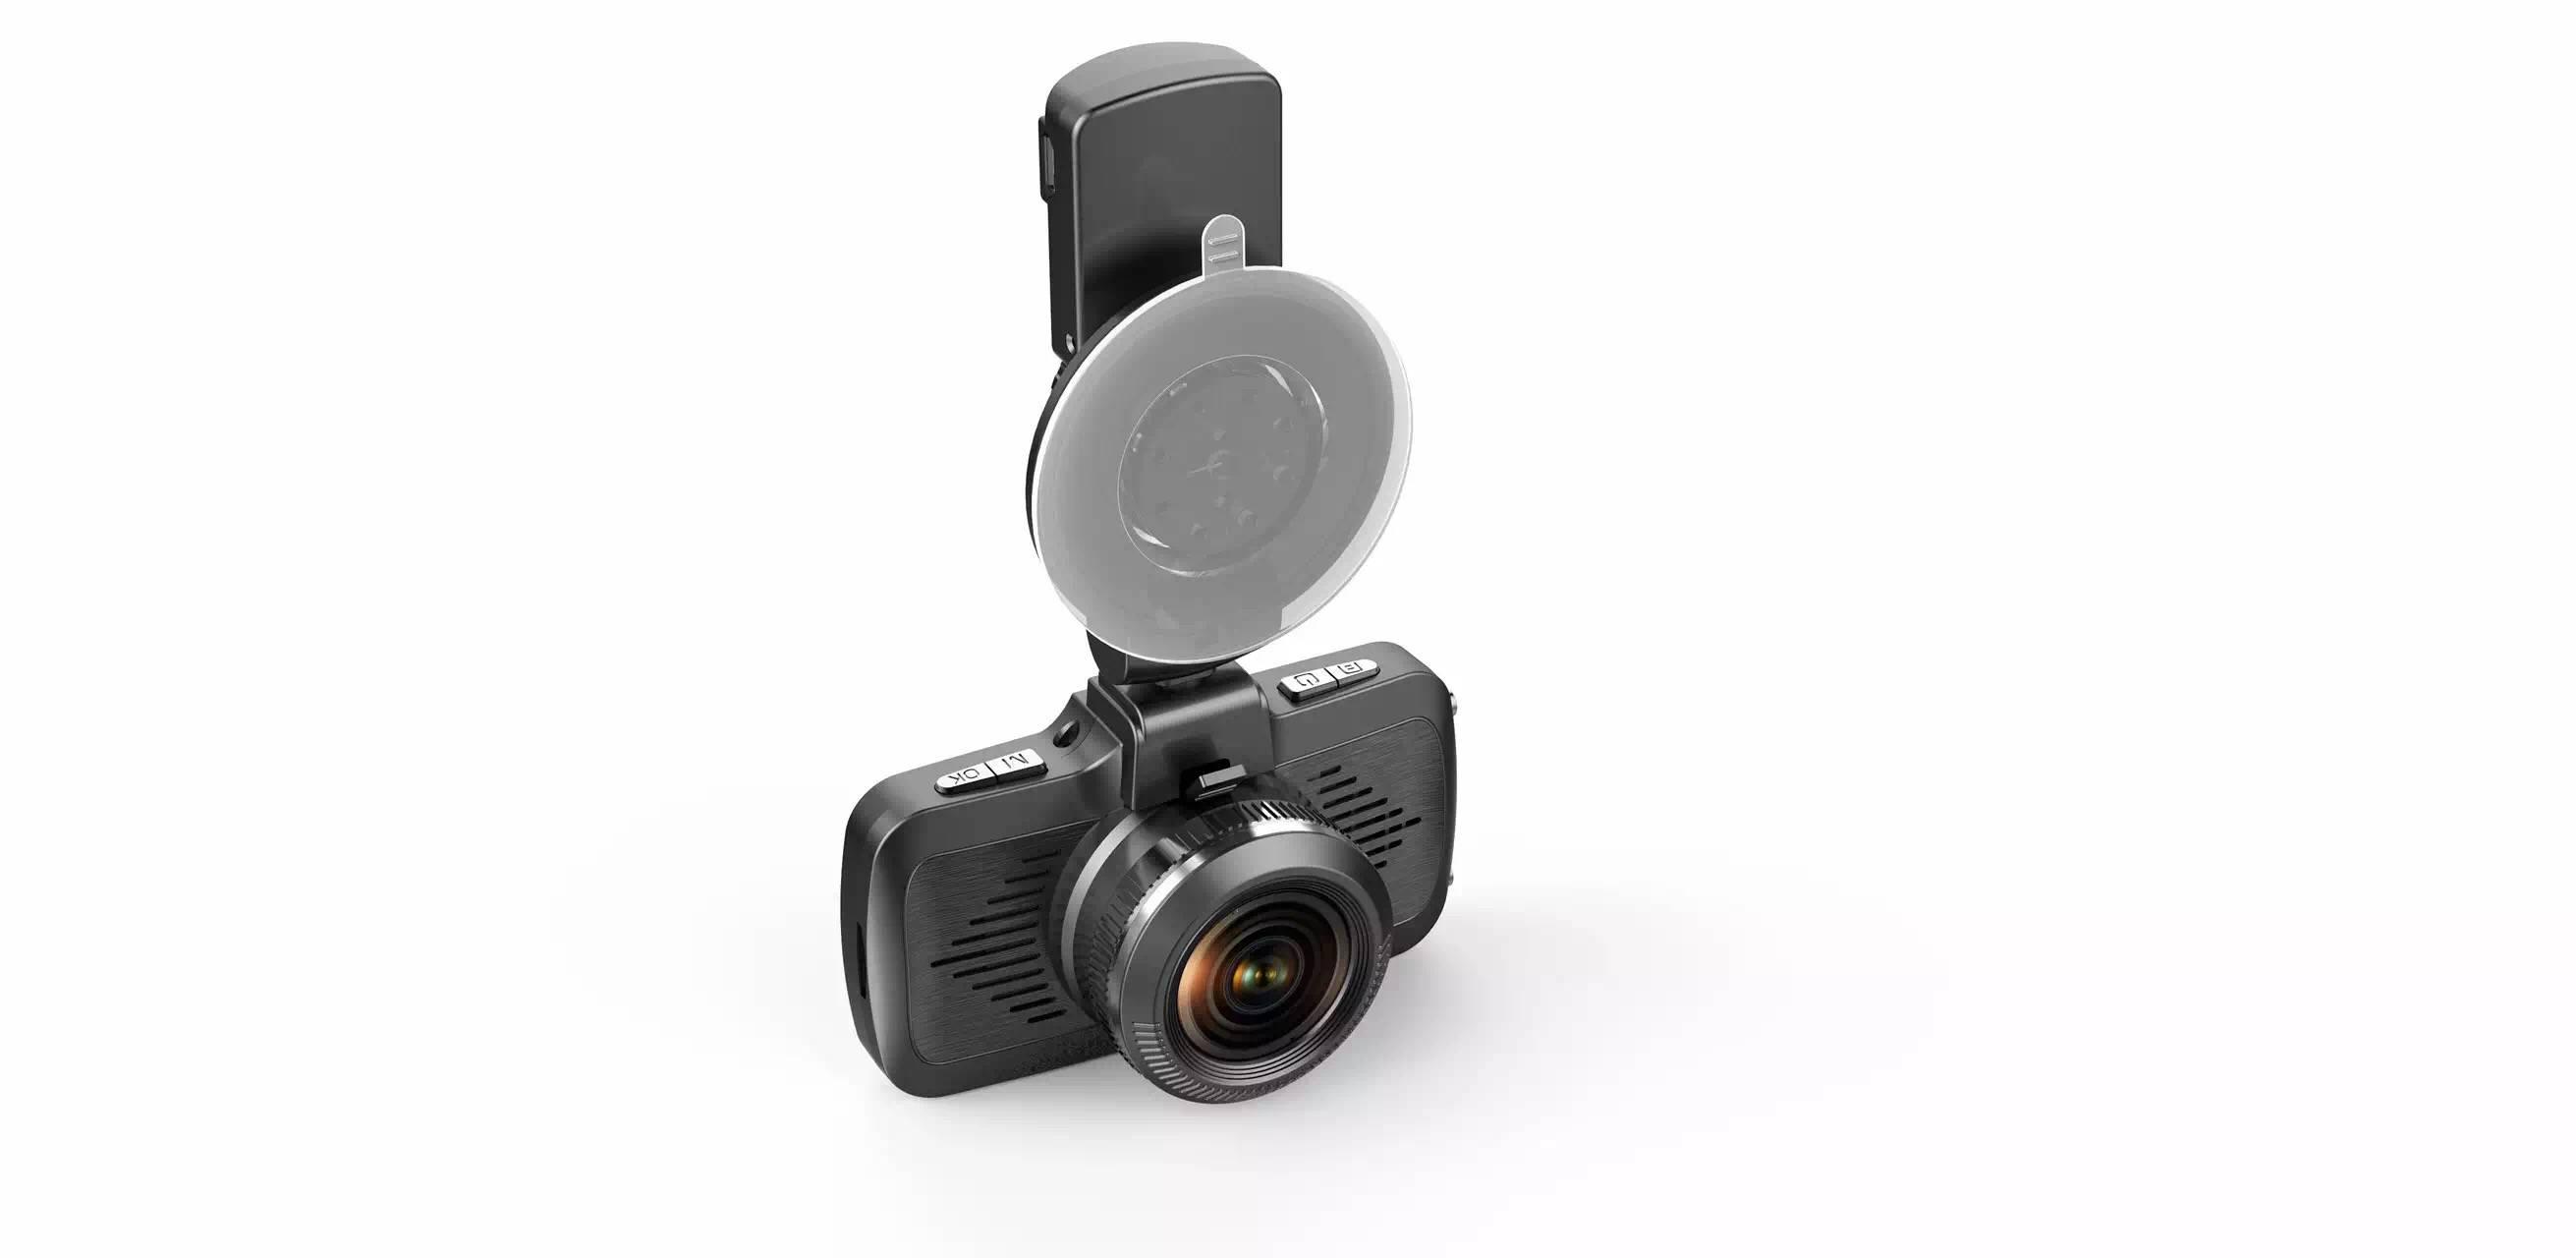 HD 1080P Car Camera Ambarella A7 LA50 Car Dashcam Nice Night Vision With GPS Speed Alarm